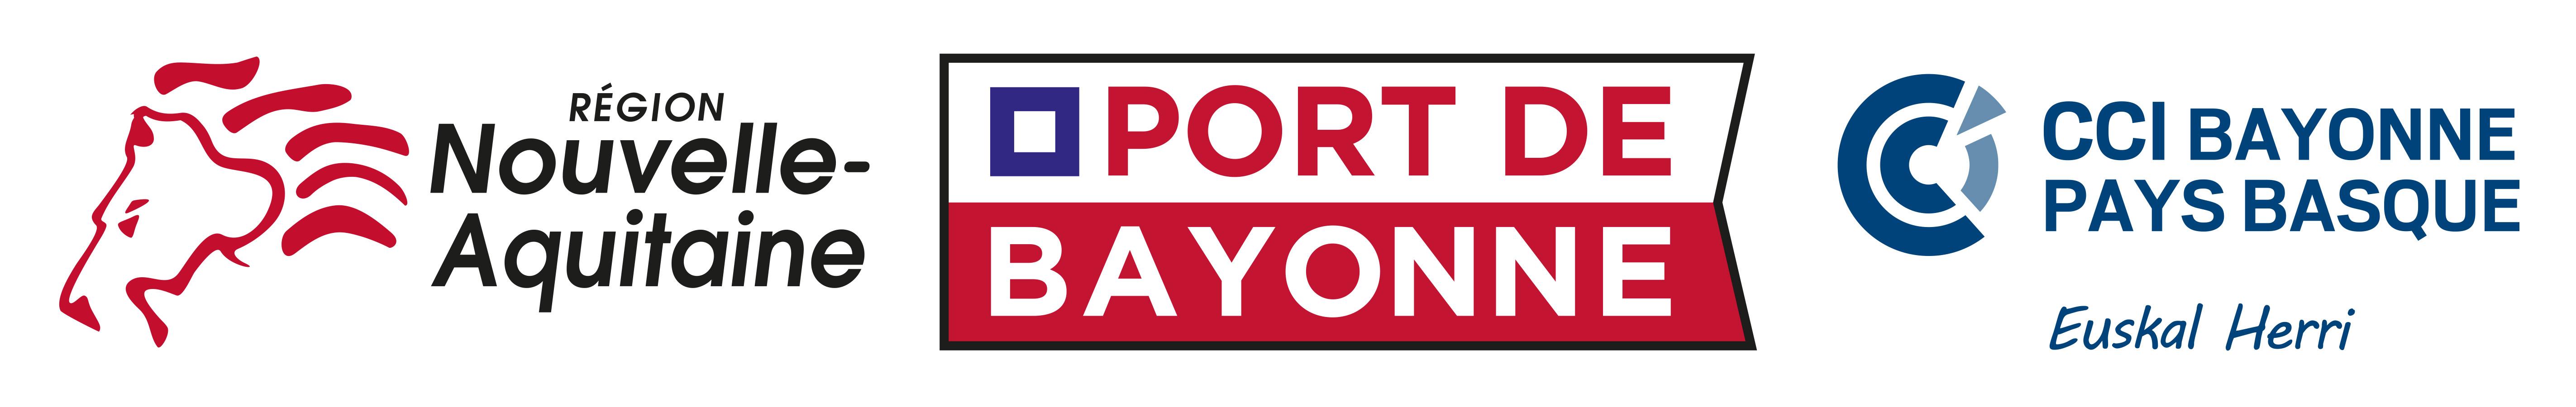 Allée De Niert Bayonne contact us - port de bayonne